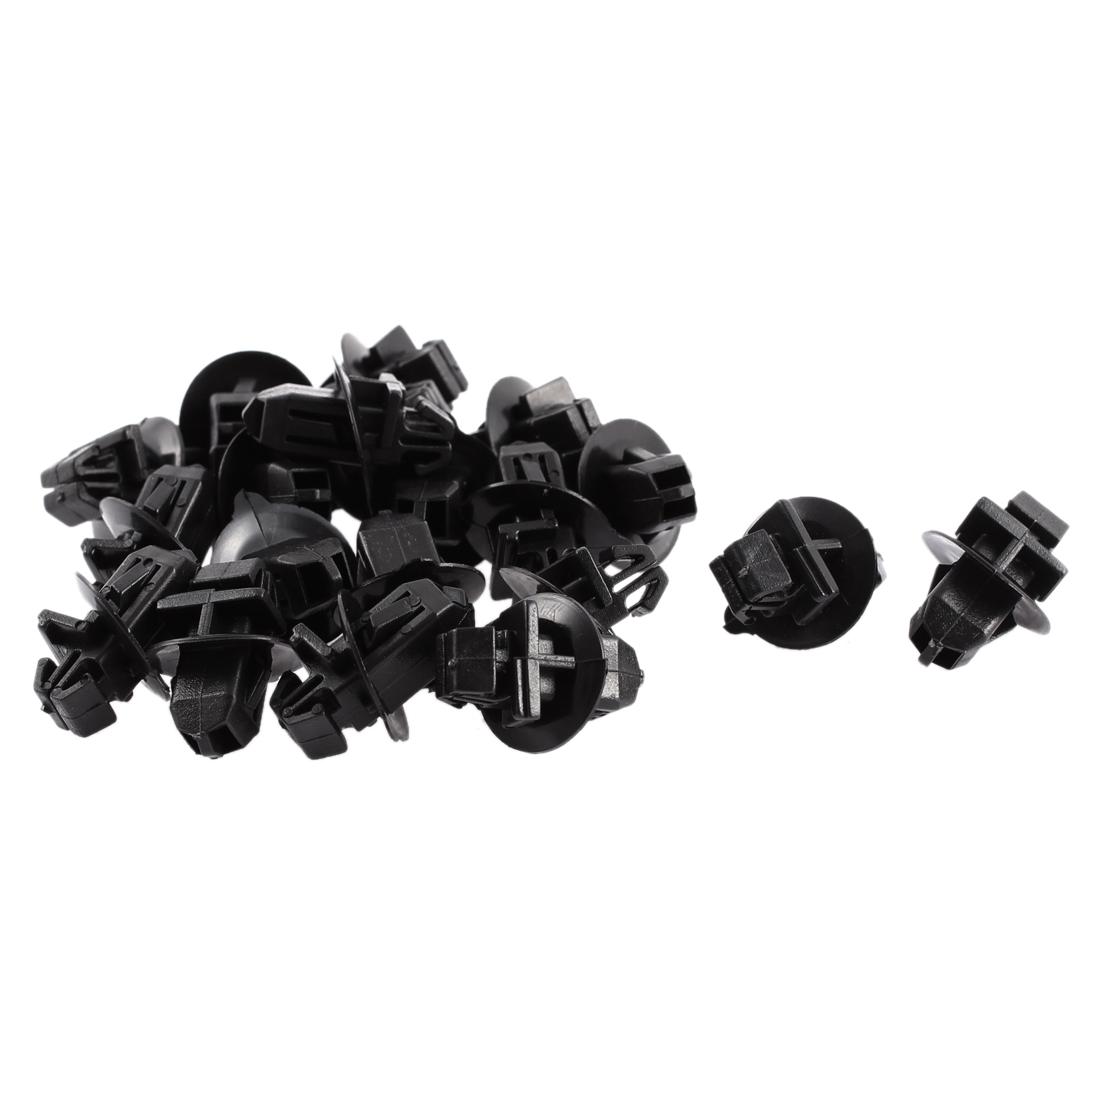 20 Pcs Black Plastic Rivet Bumper Lining Moulding Snap Clips for Toyota Prado